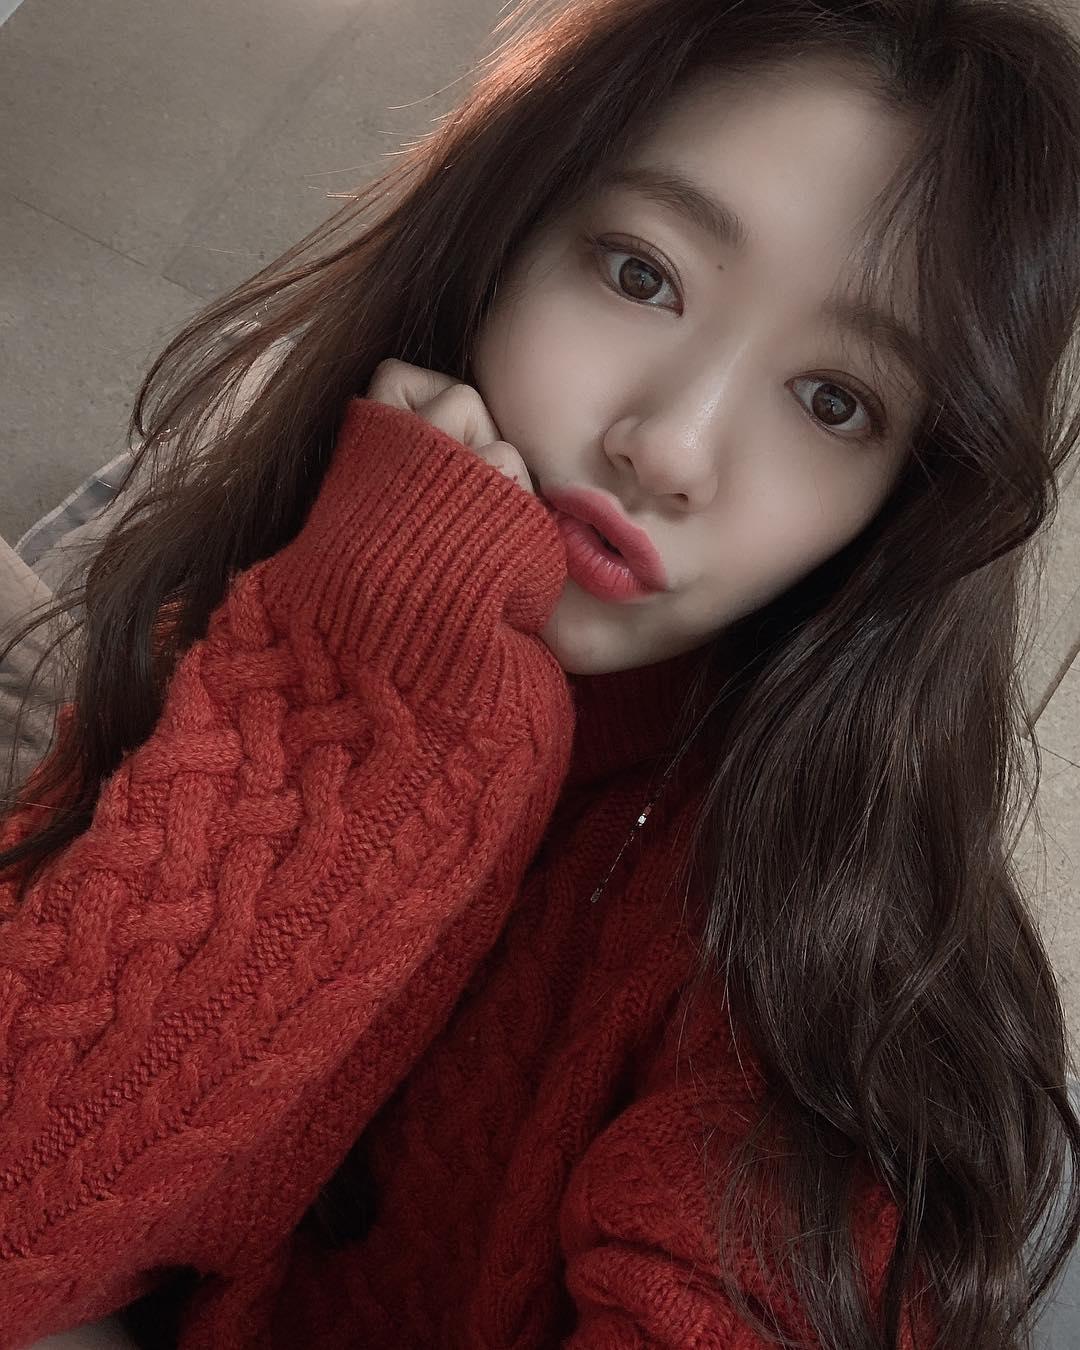 Park Shin hye actress hot pics